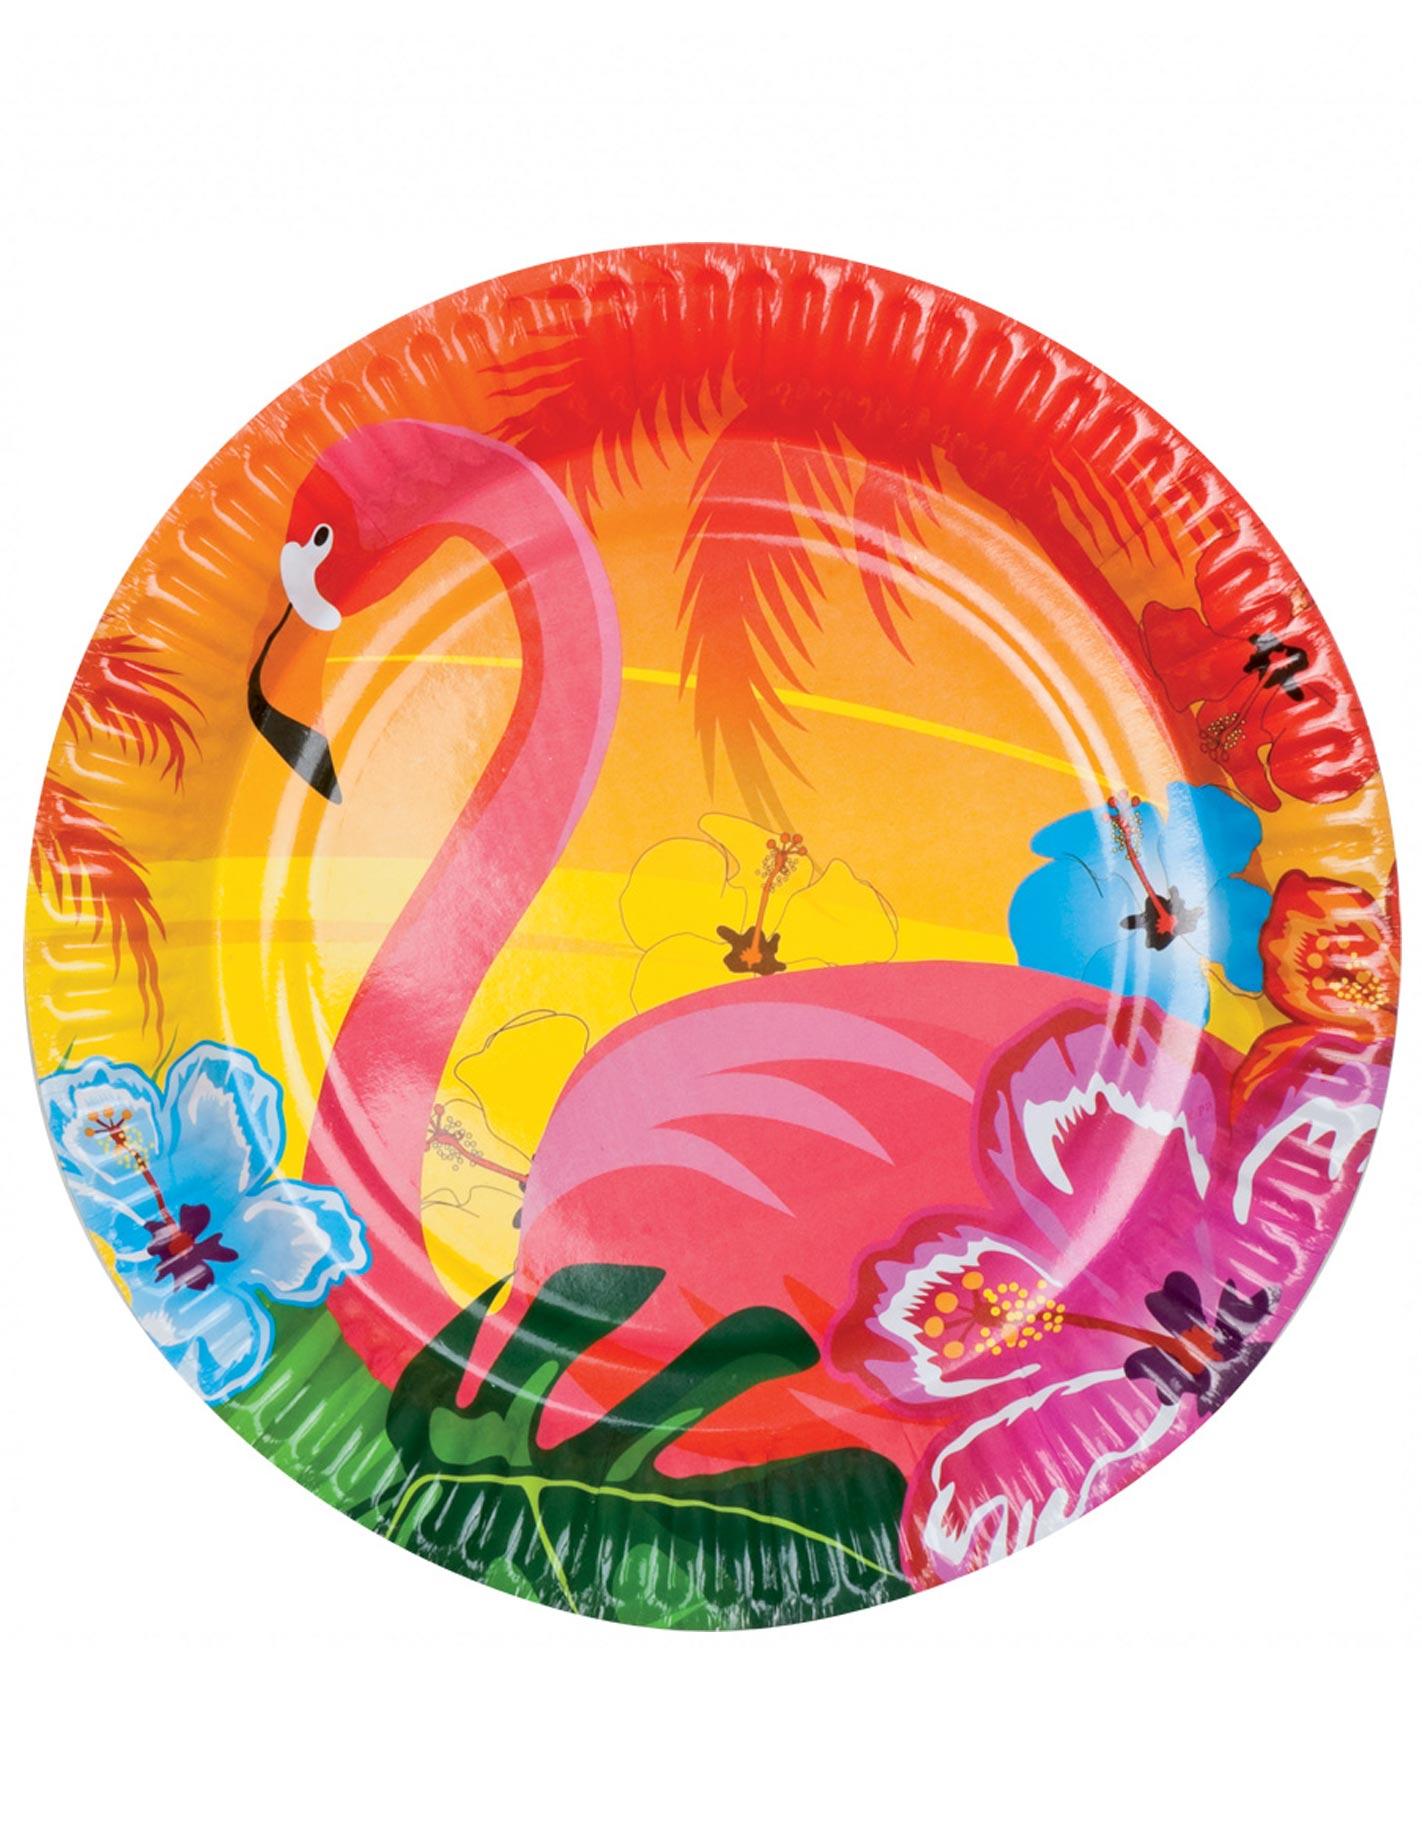 6 hawa borden decoratie en goedkope carnavalskleding vegaoo for Goedkope decoratie